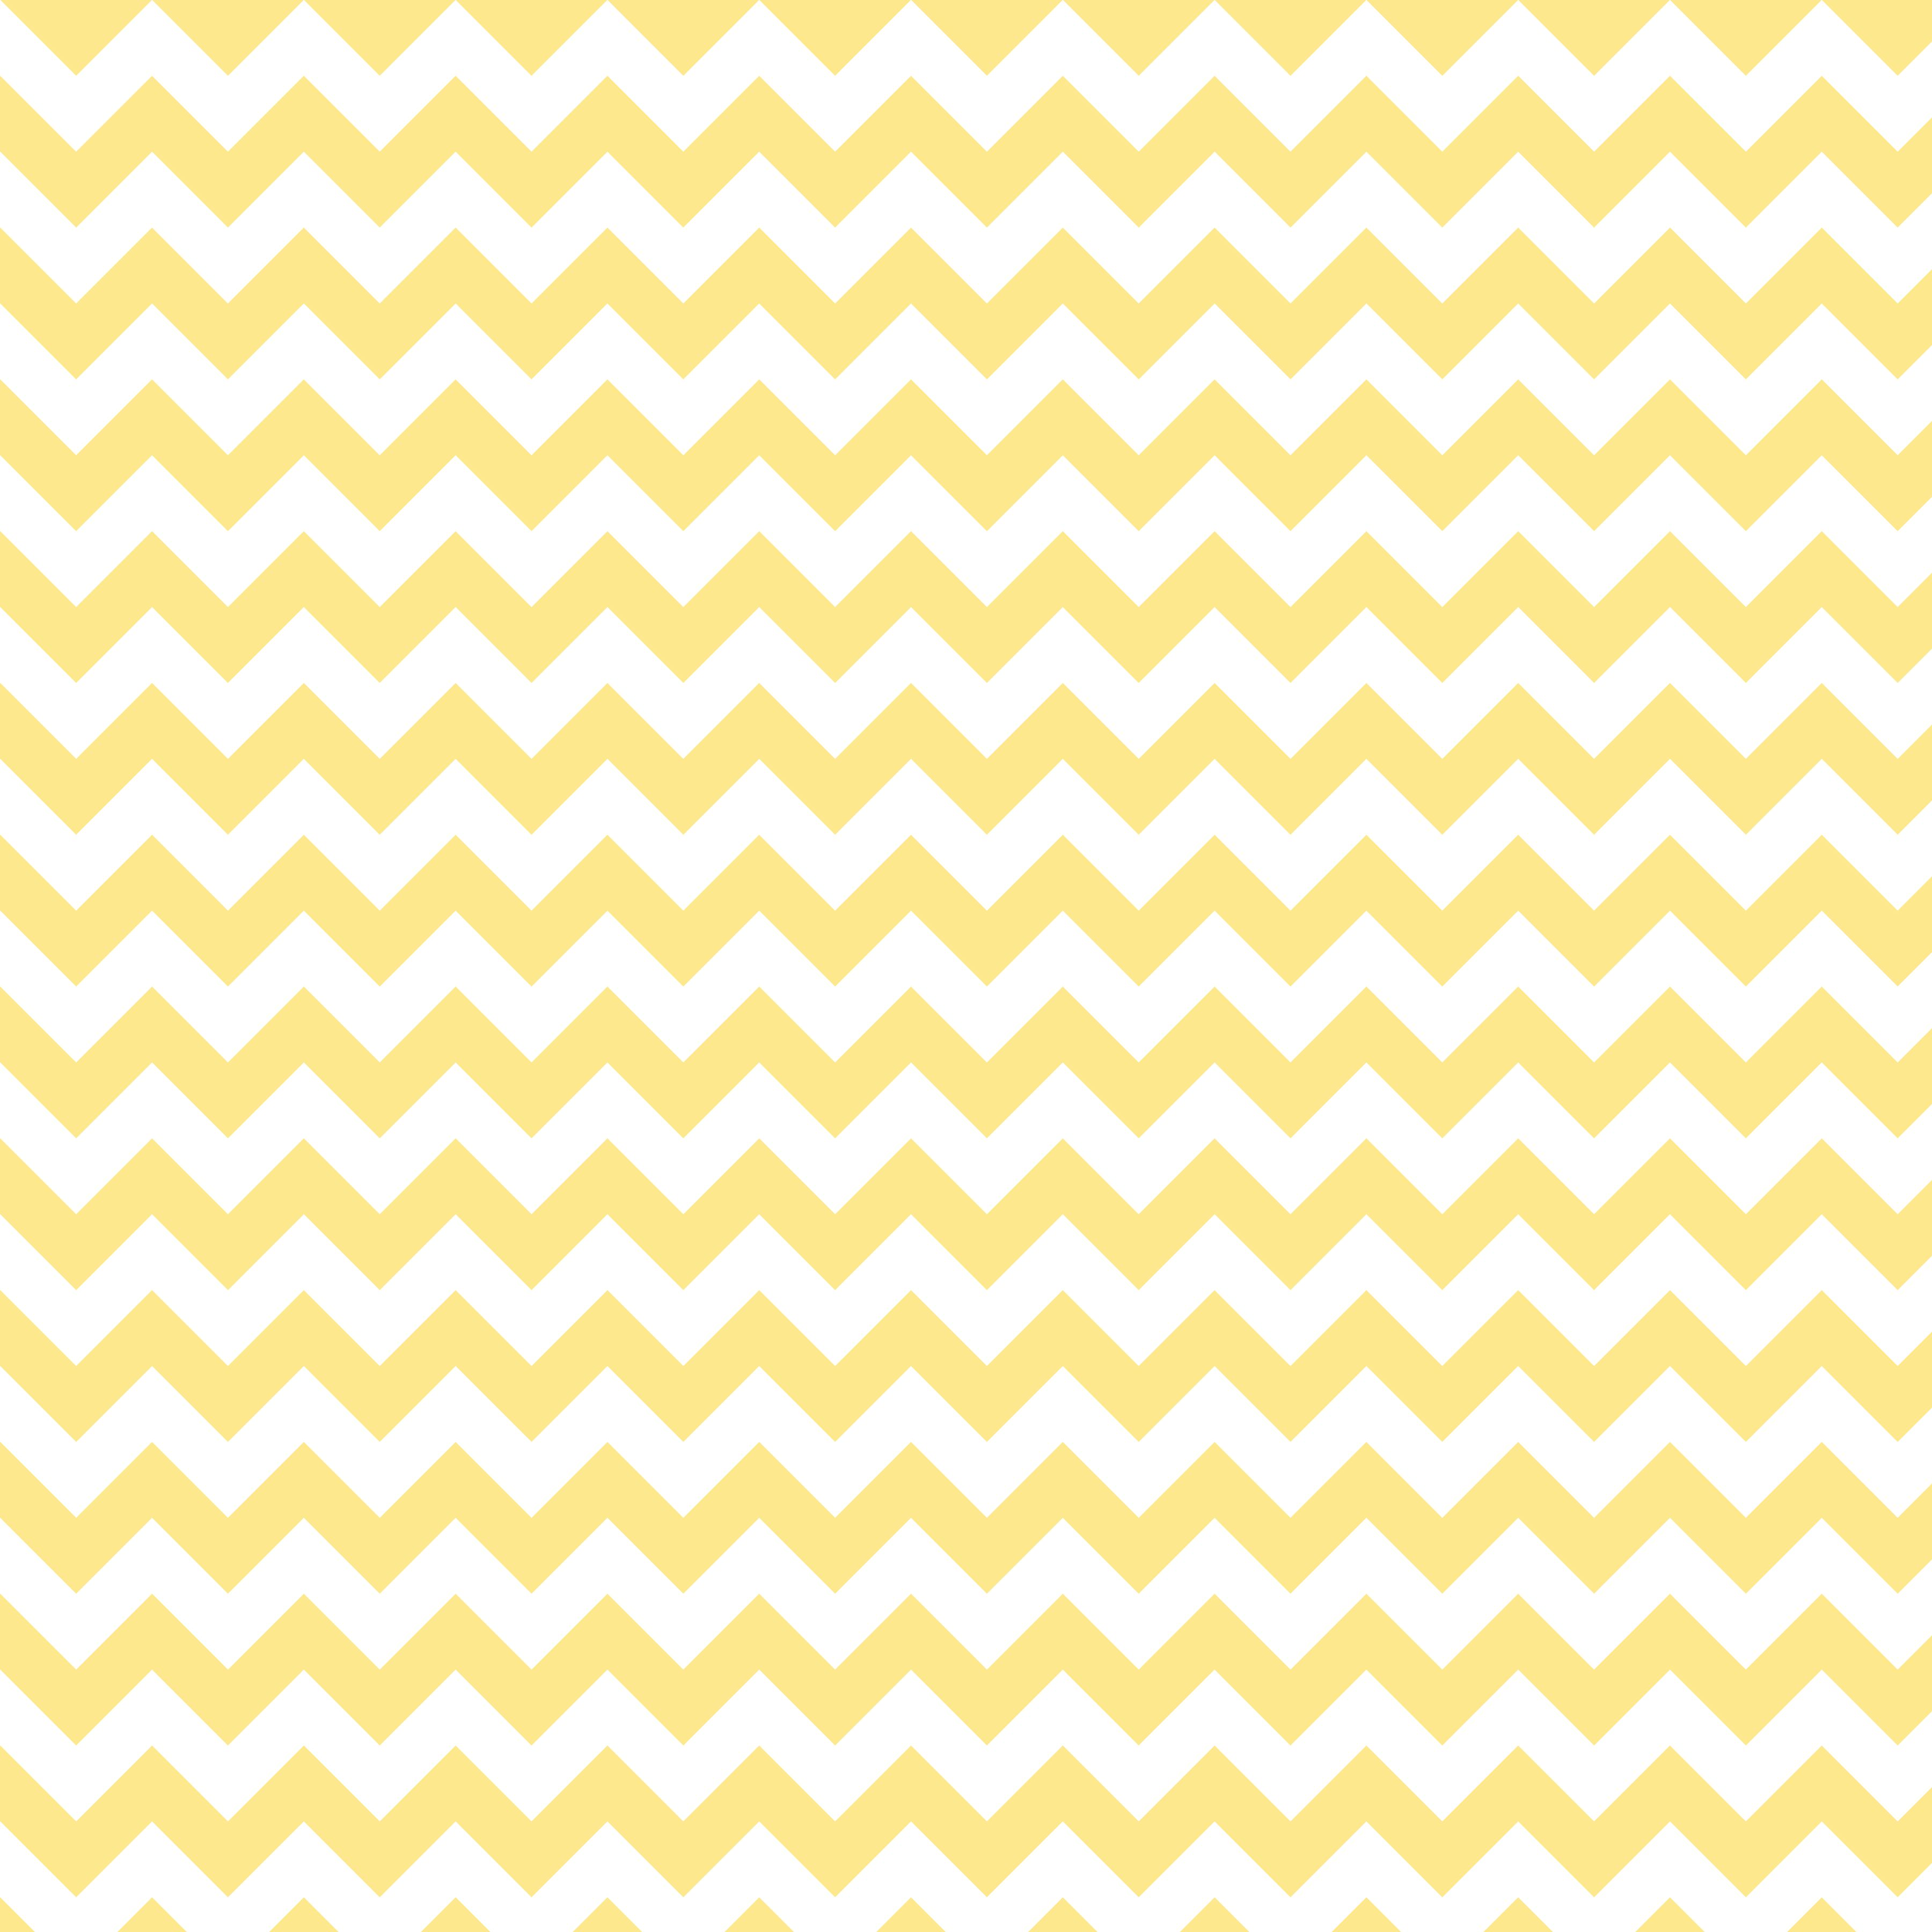 Pastel Chevron Digital Paper-Seamless example image 2